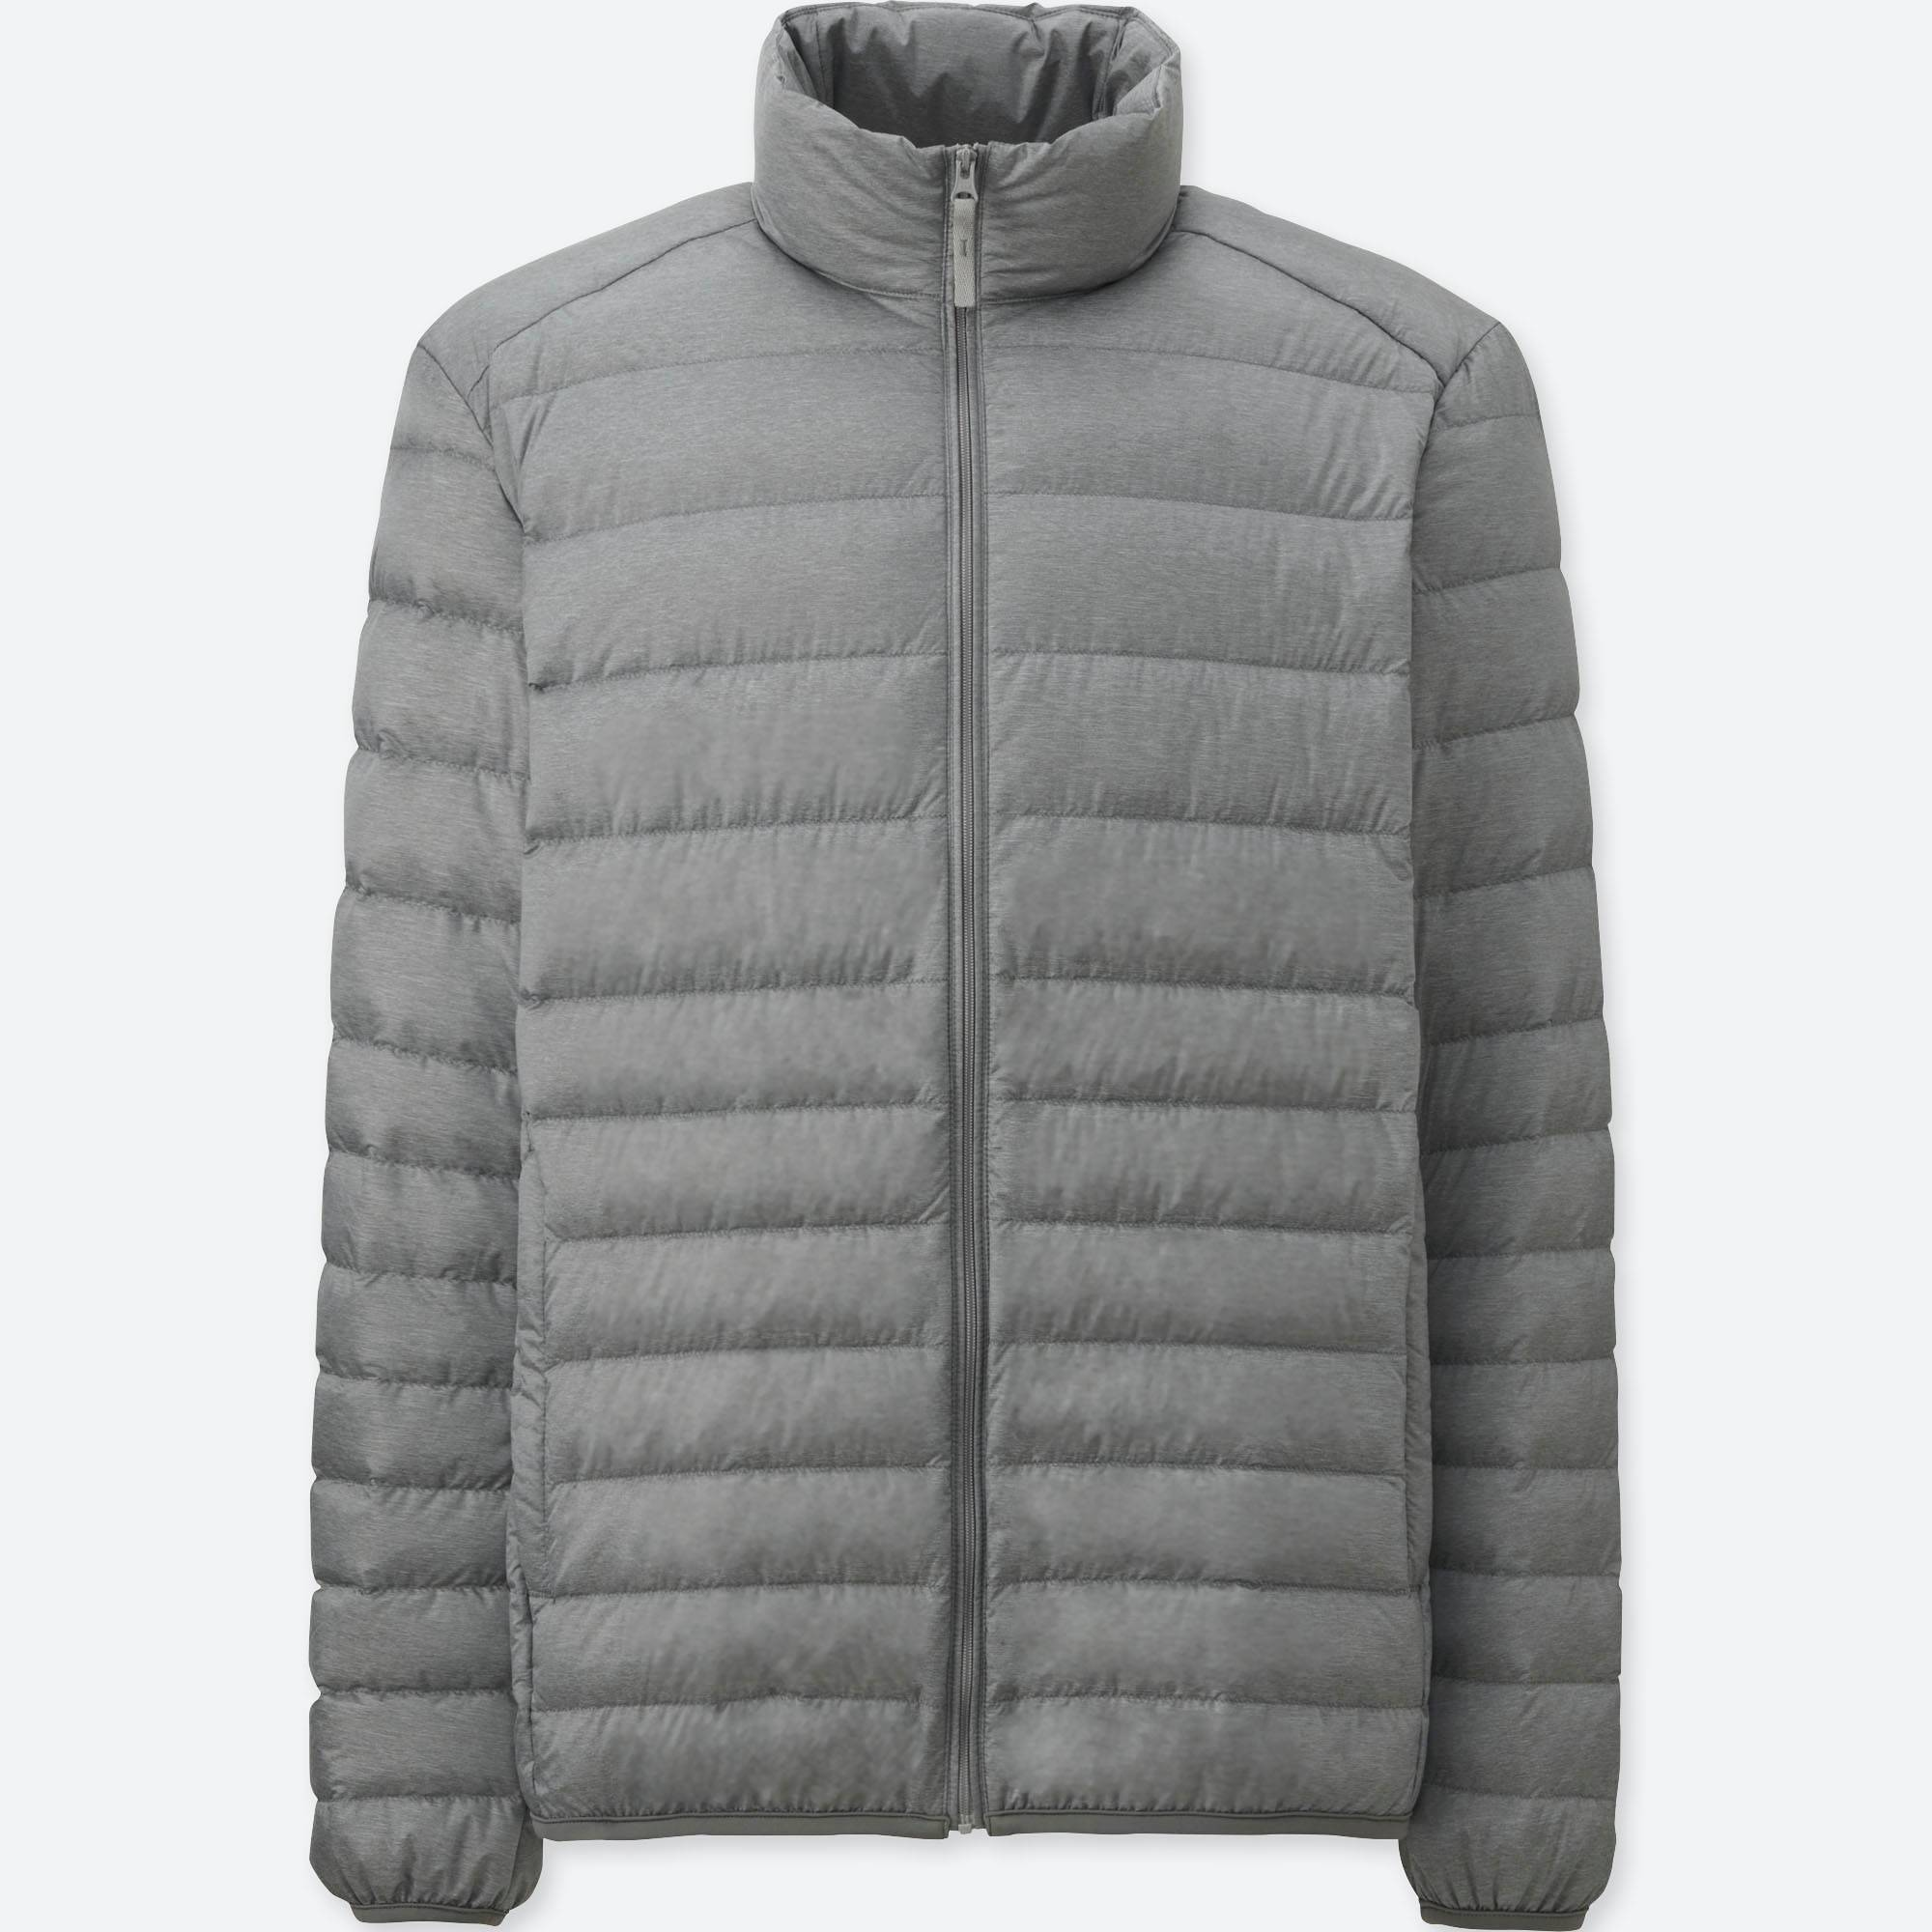 MEN ULTRA LIGHT DOWN JACKET | UNIQLO US : uniqlo quilted jacket - Adamdwight.com